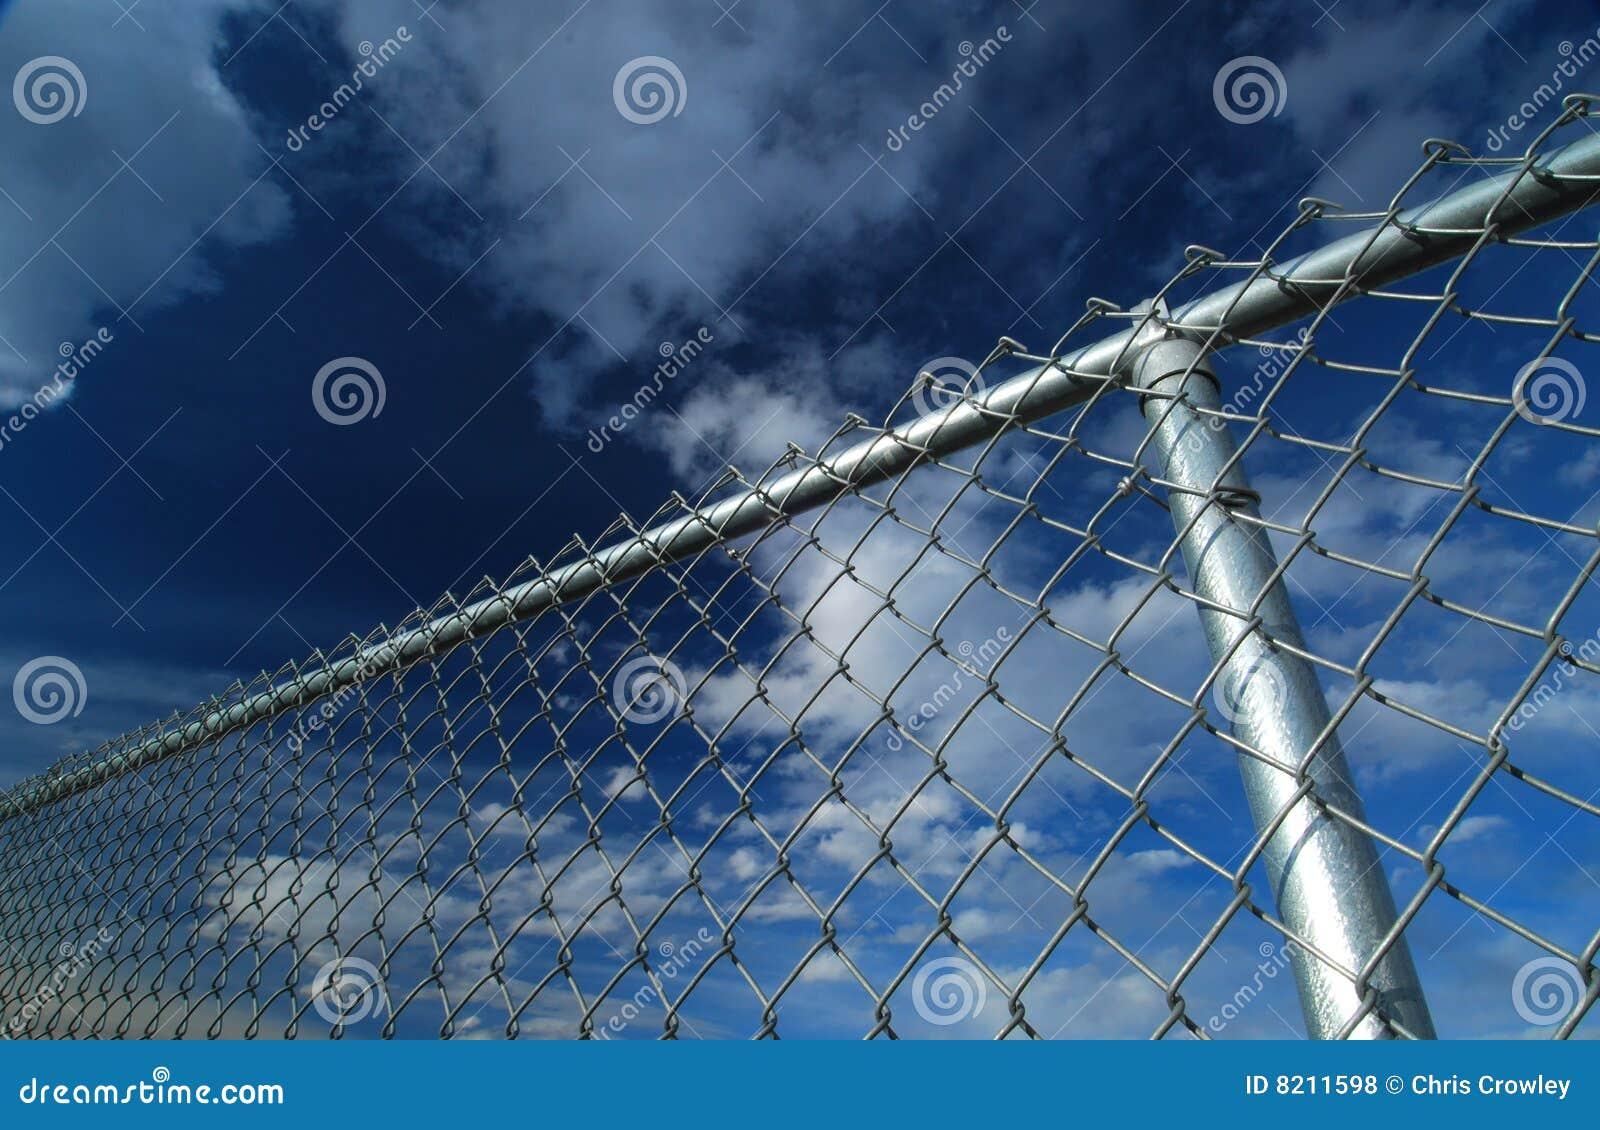 Essay on Fences Against Freedom